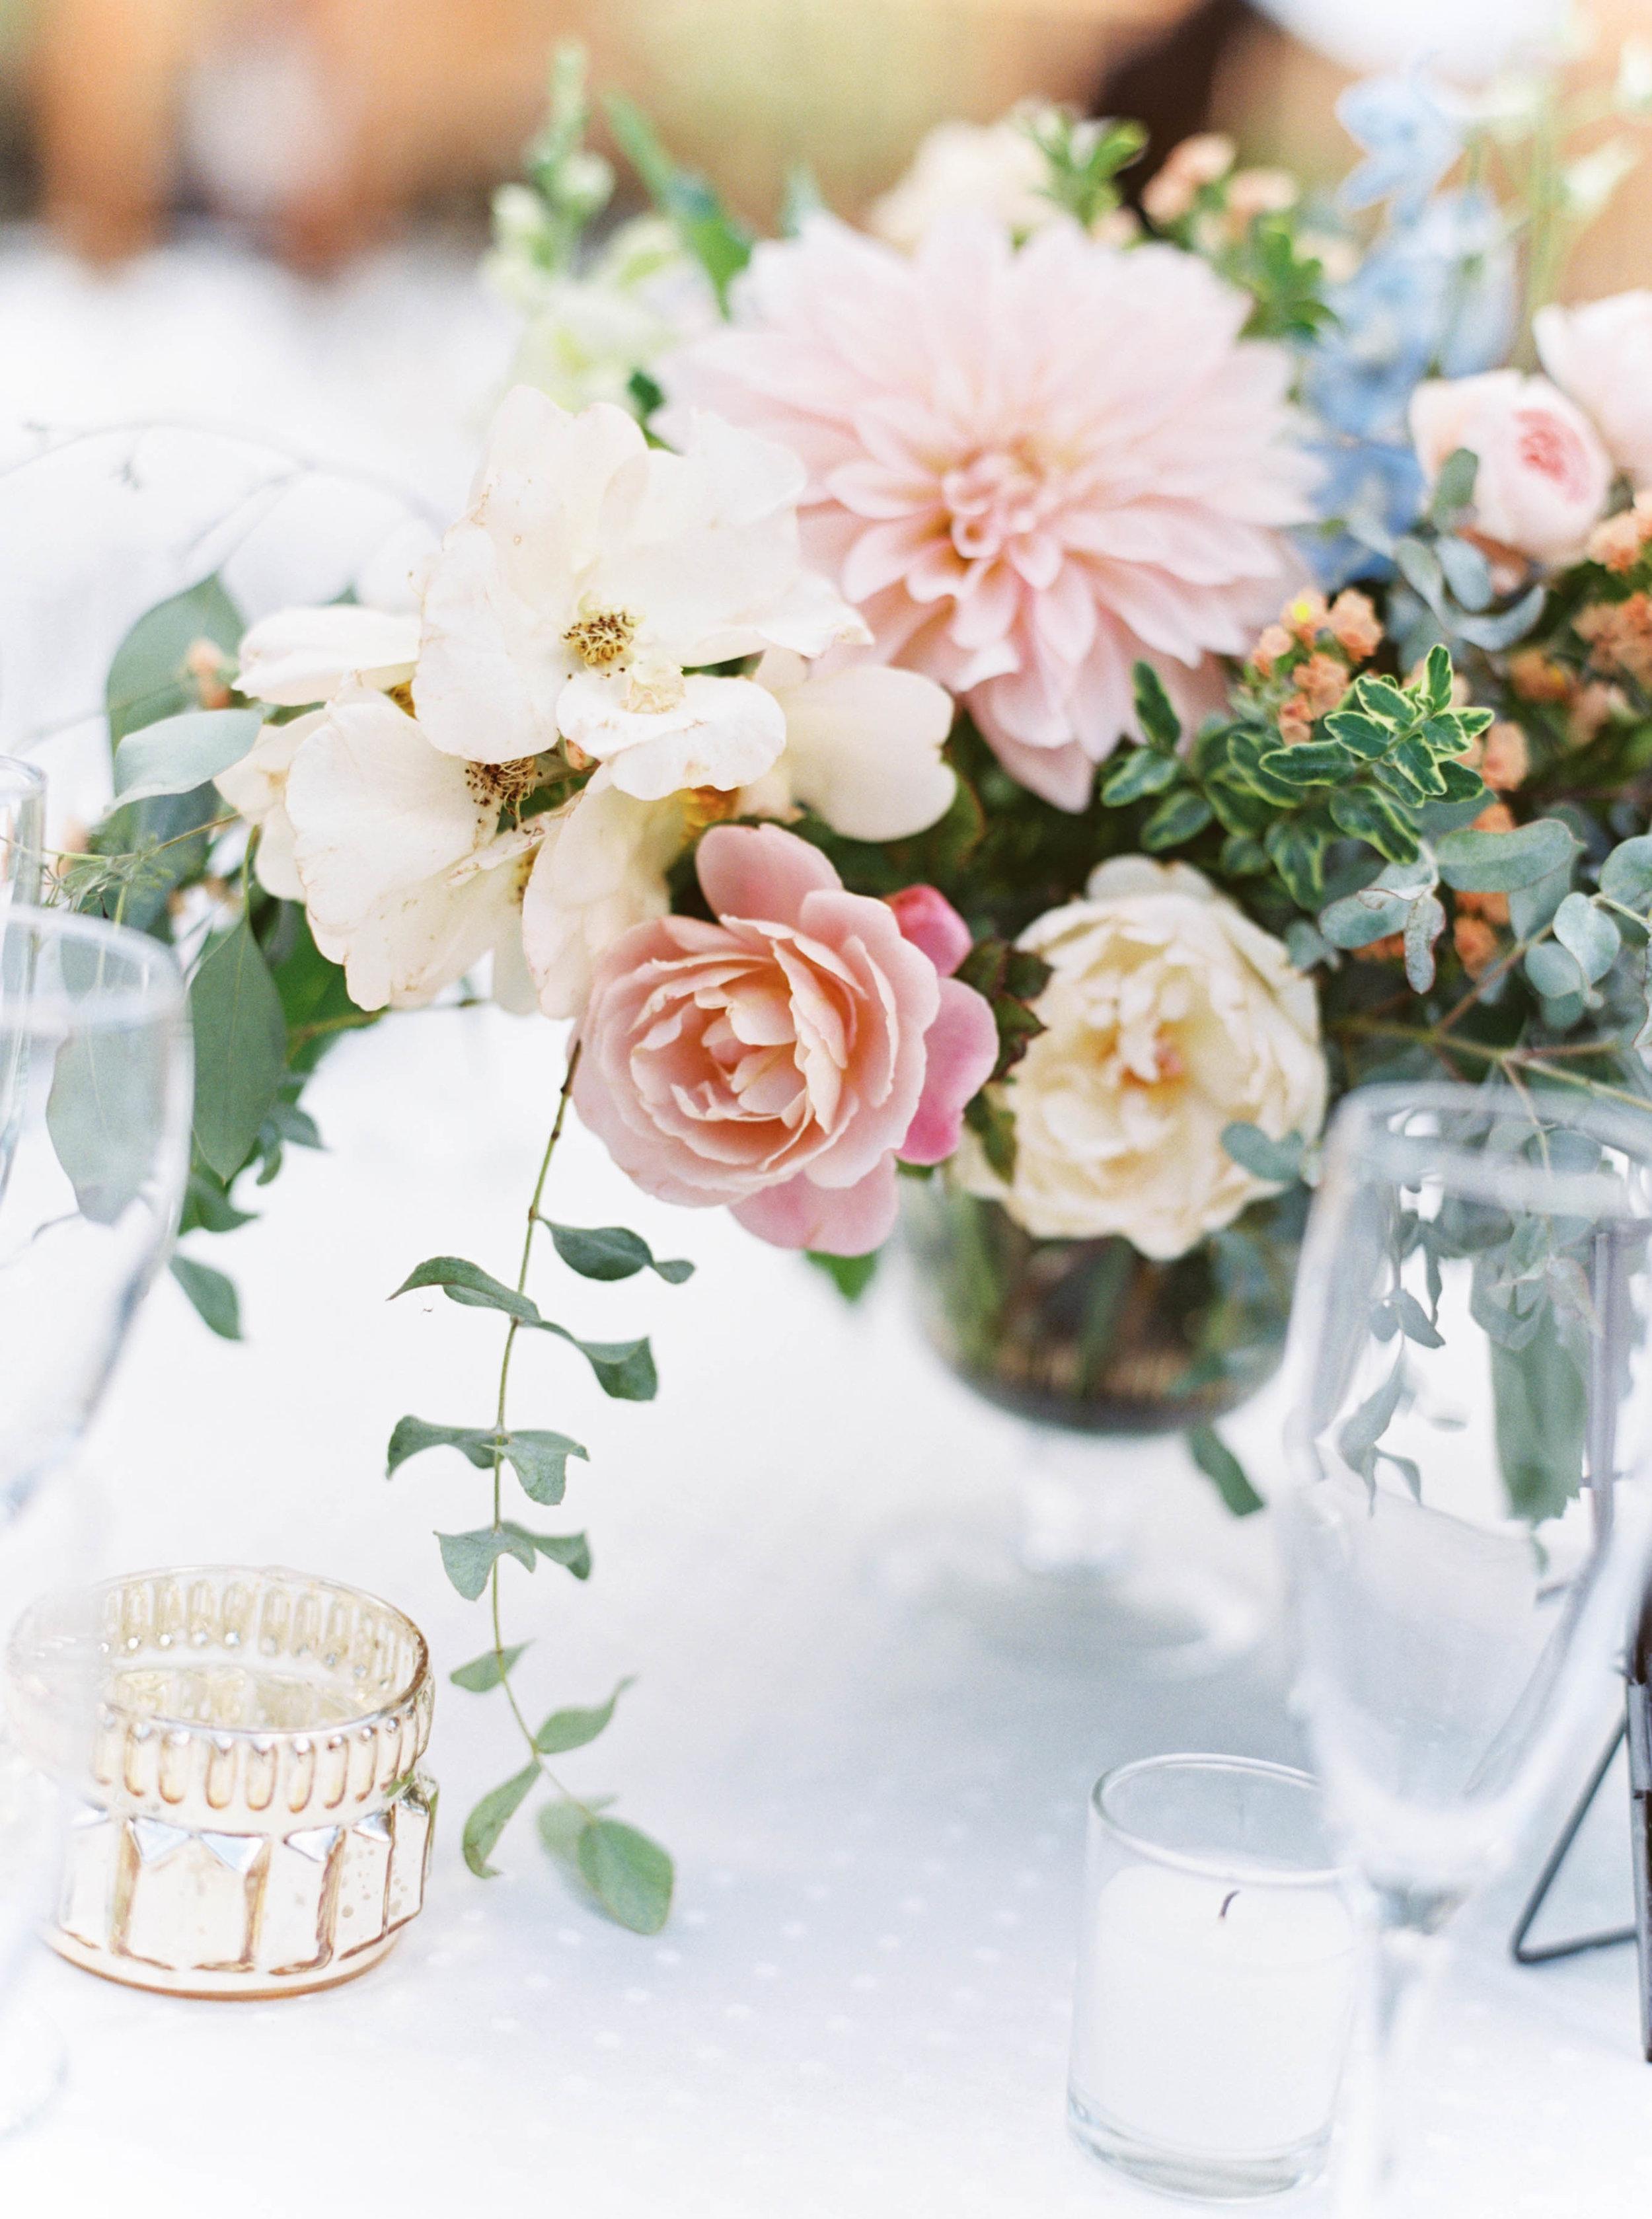 wedding floral centerpiece with cafe au lait dahlia by foraged floral for oregon wedding.jpg